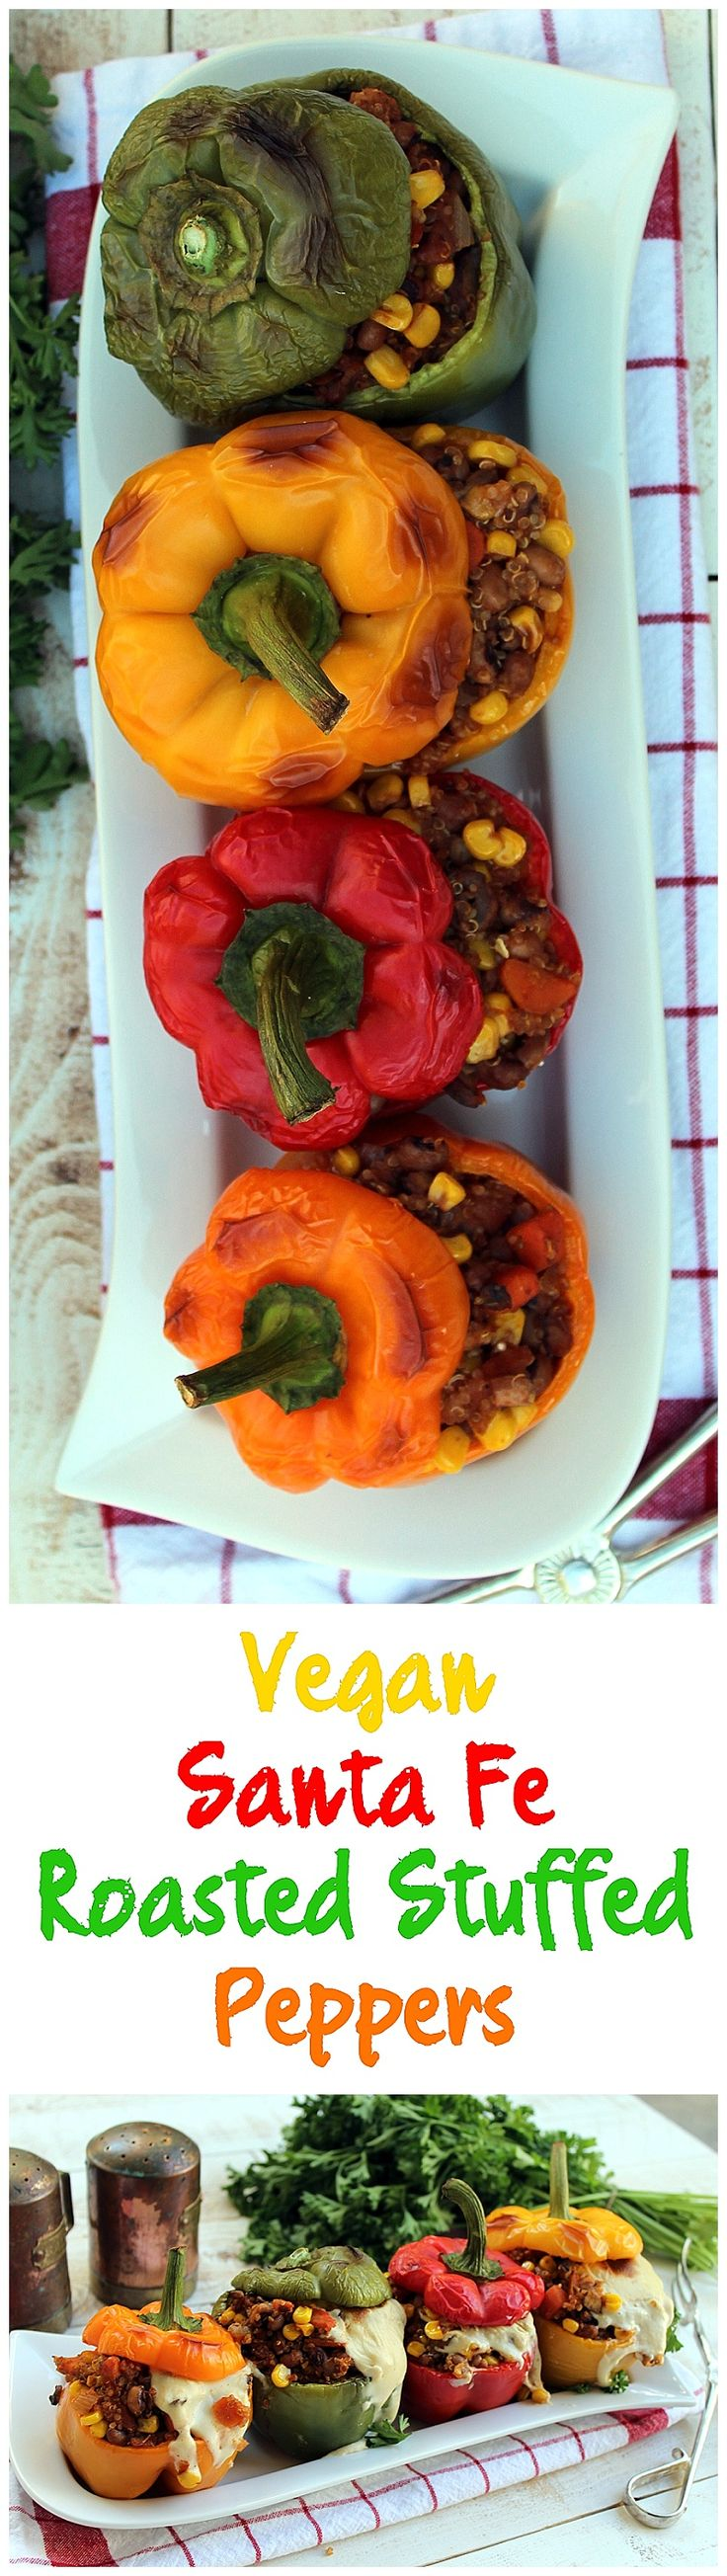 Santa Fe Roasted Stuffed Peppers…